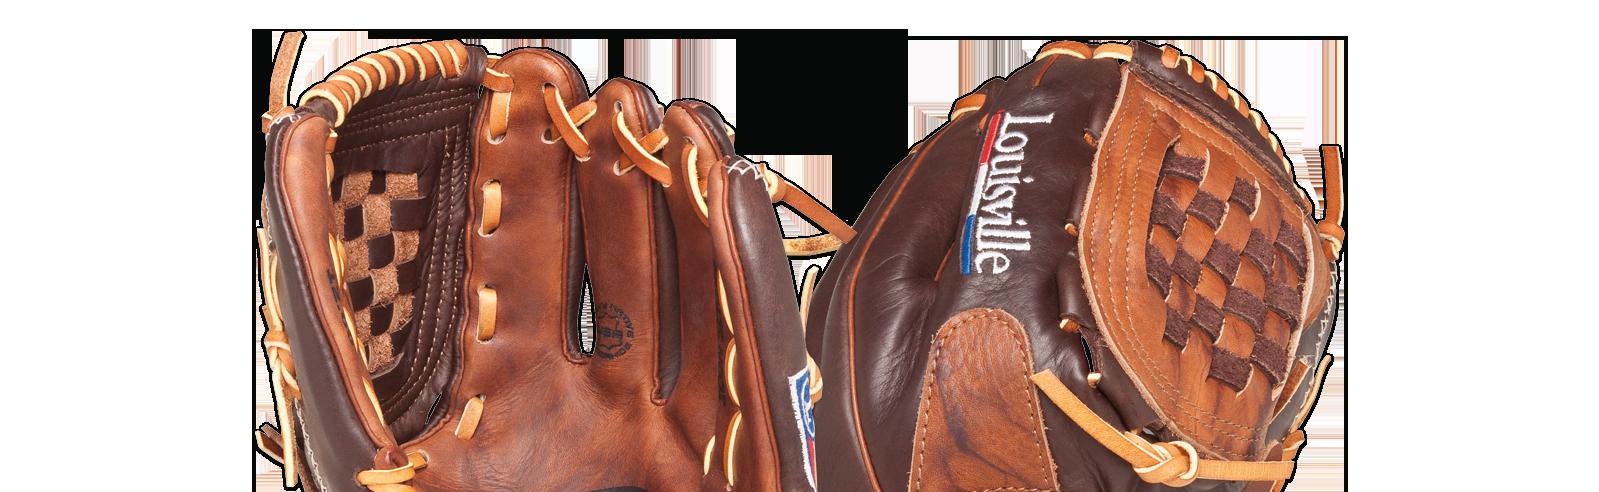 IC1200-field-glove-02